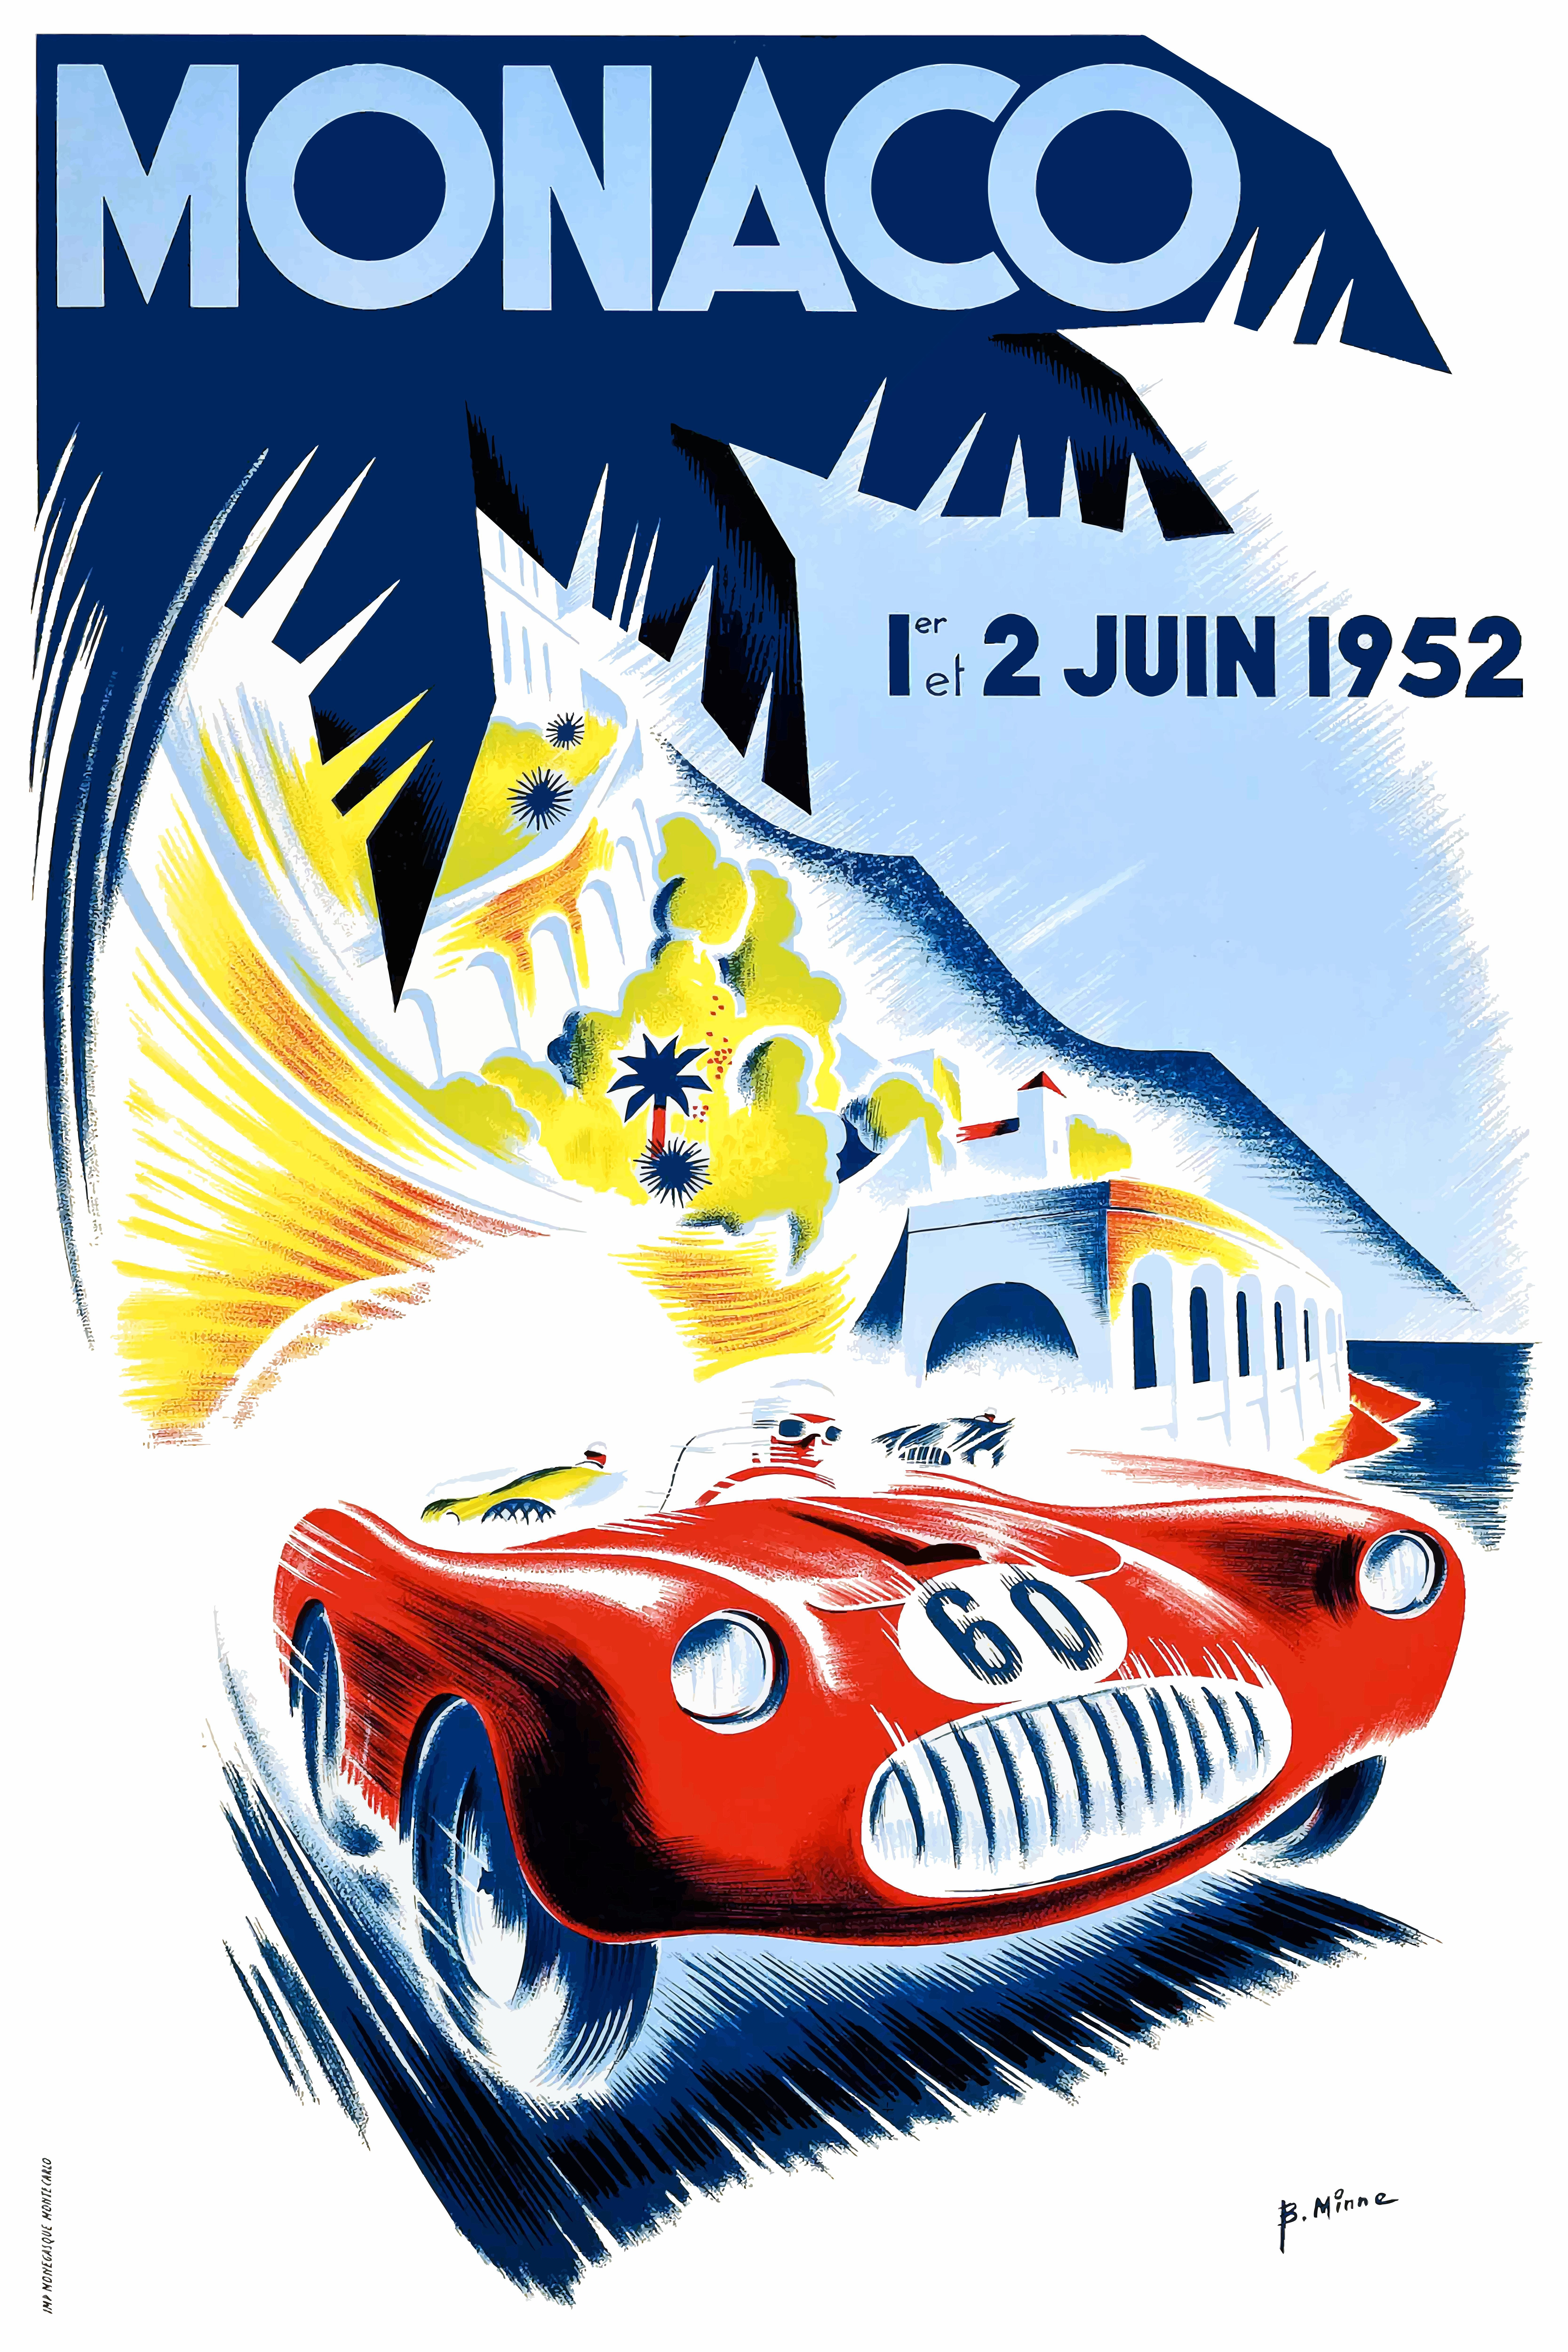 1952 Monaco Grand Prix Race Poster By Retro Graphics Vintage Racing Poster Grand Prix Posters Racing Posters